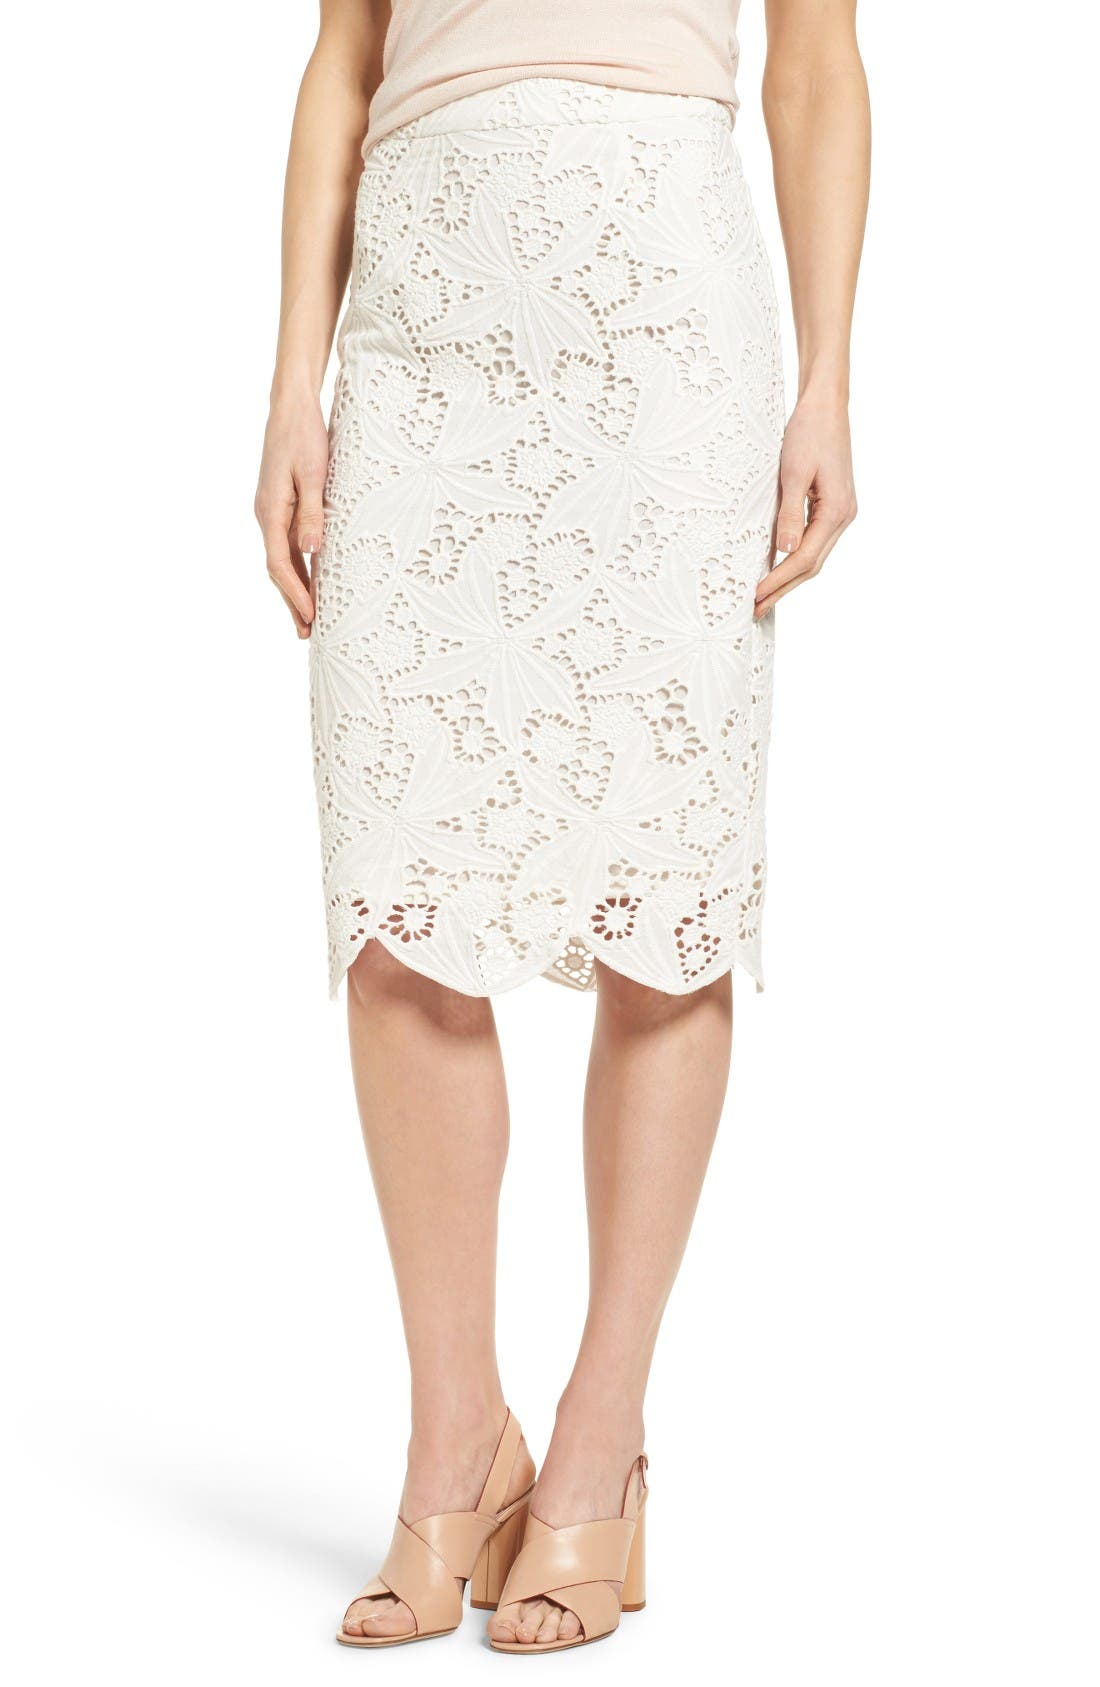 Alternate Image 1 Selected - Halogen® Scalloped Lace Pencil Skirt (Regular & Petite)